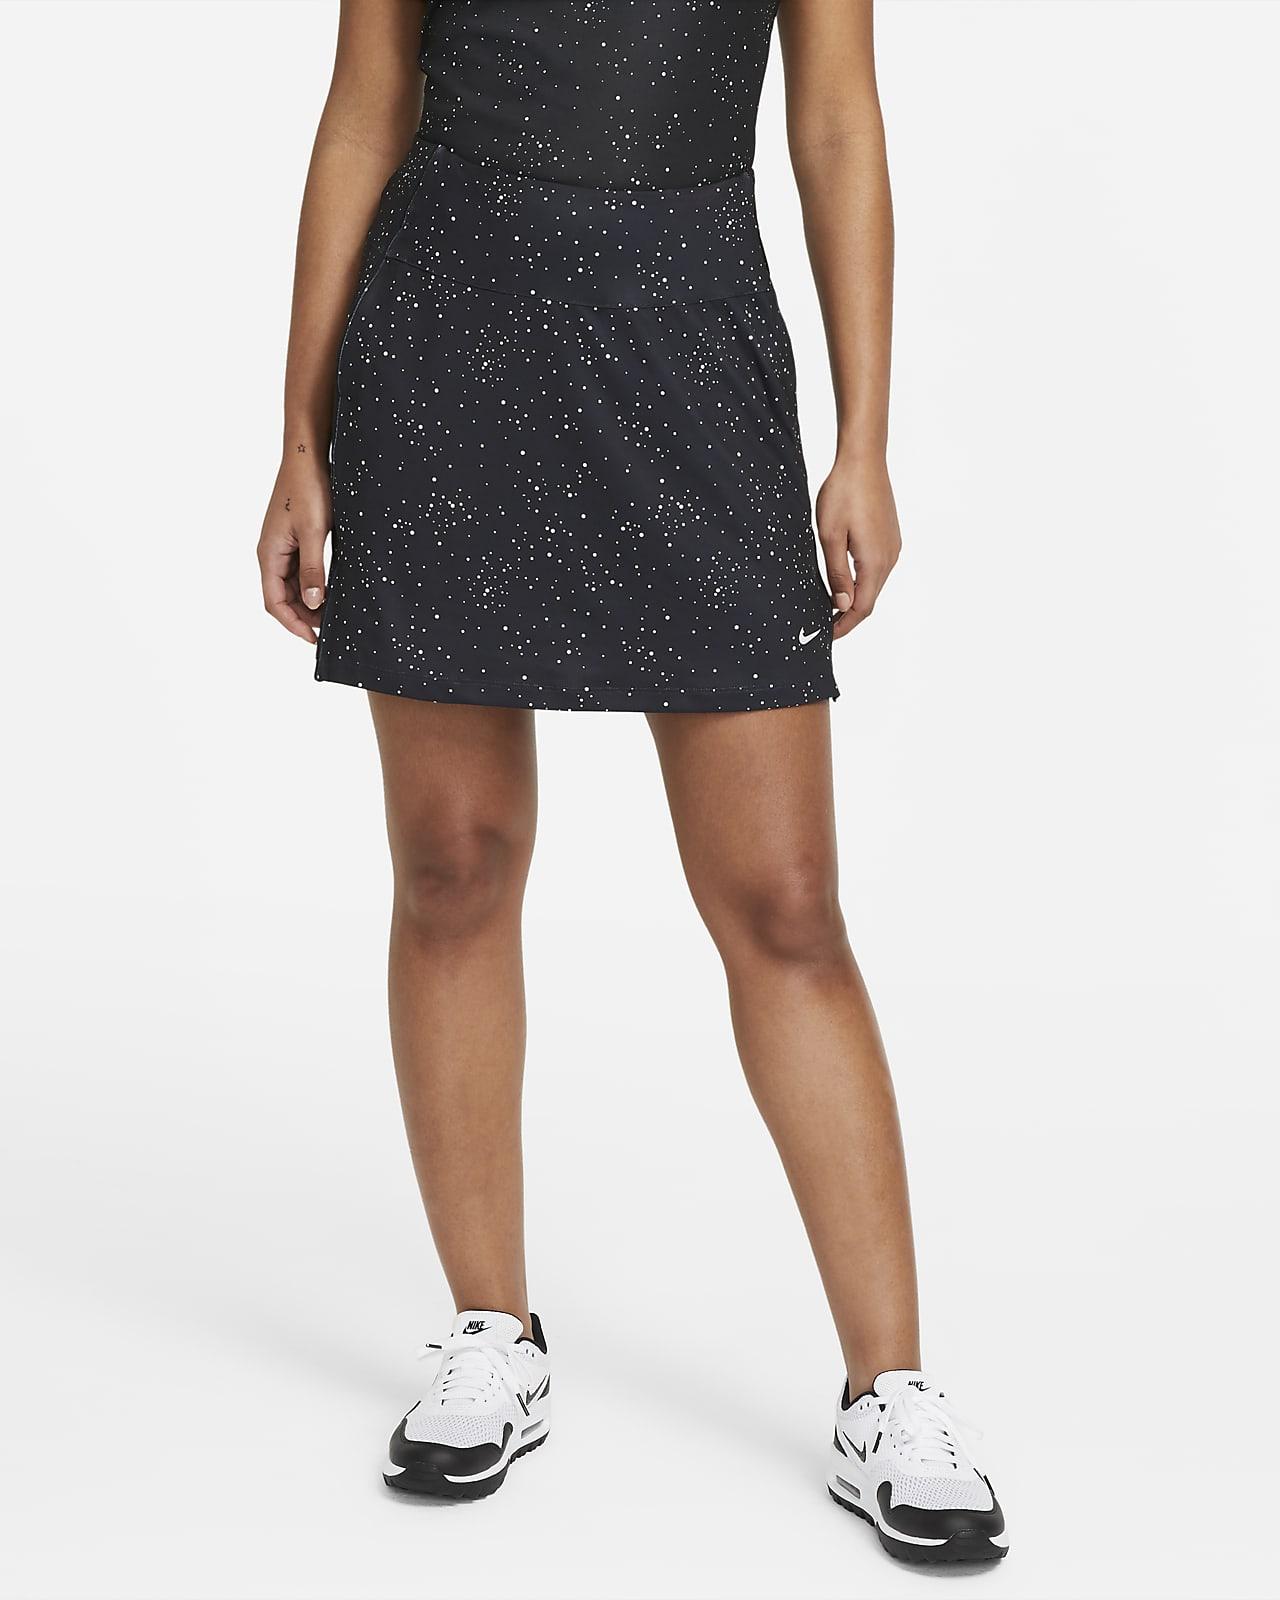 Nike Dri-FIT UV Women's Printed Golf Skirt